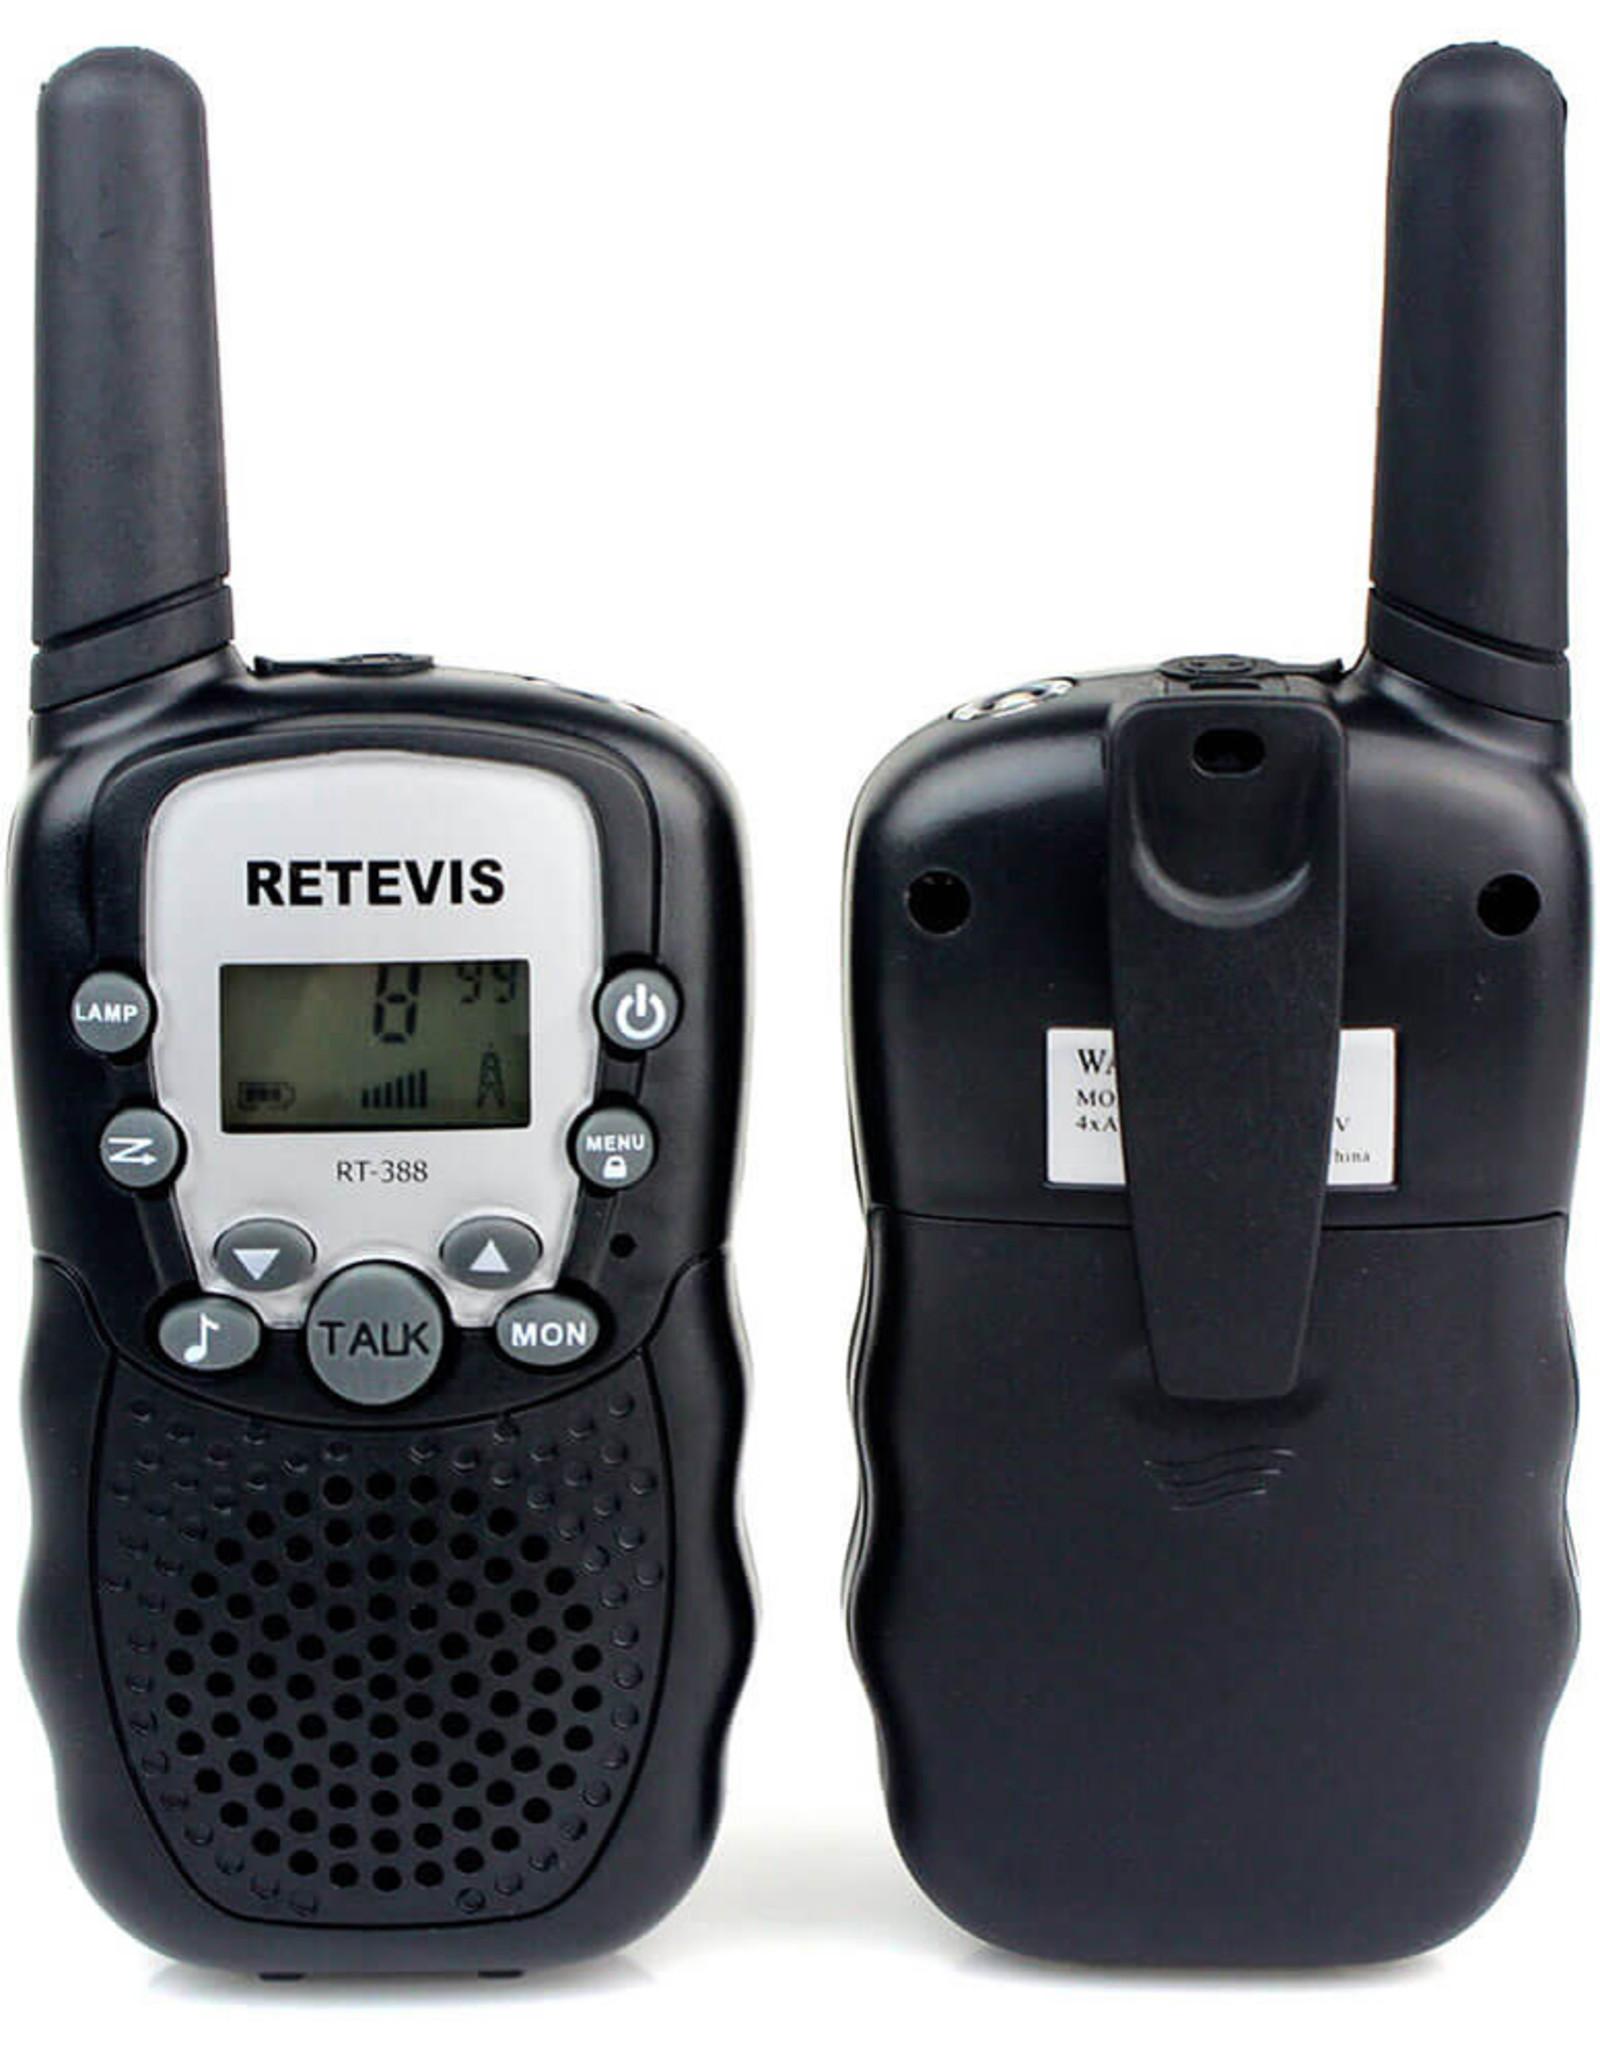 Retevis Walkie Talkies with Flashlight - Black